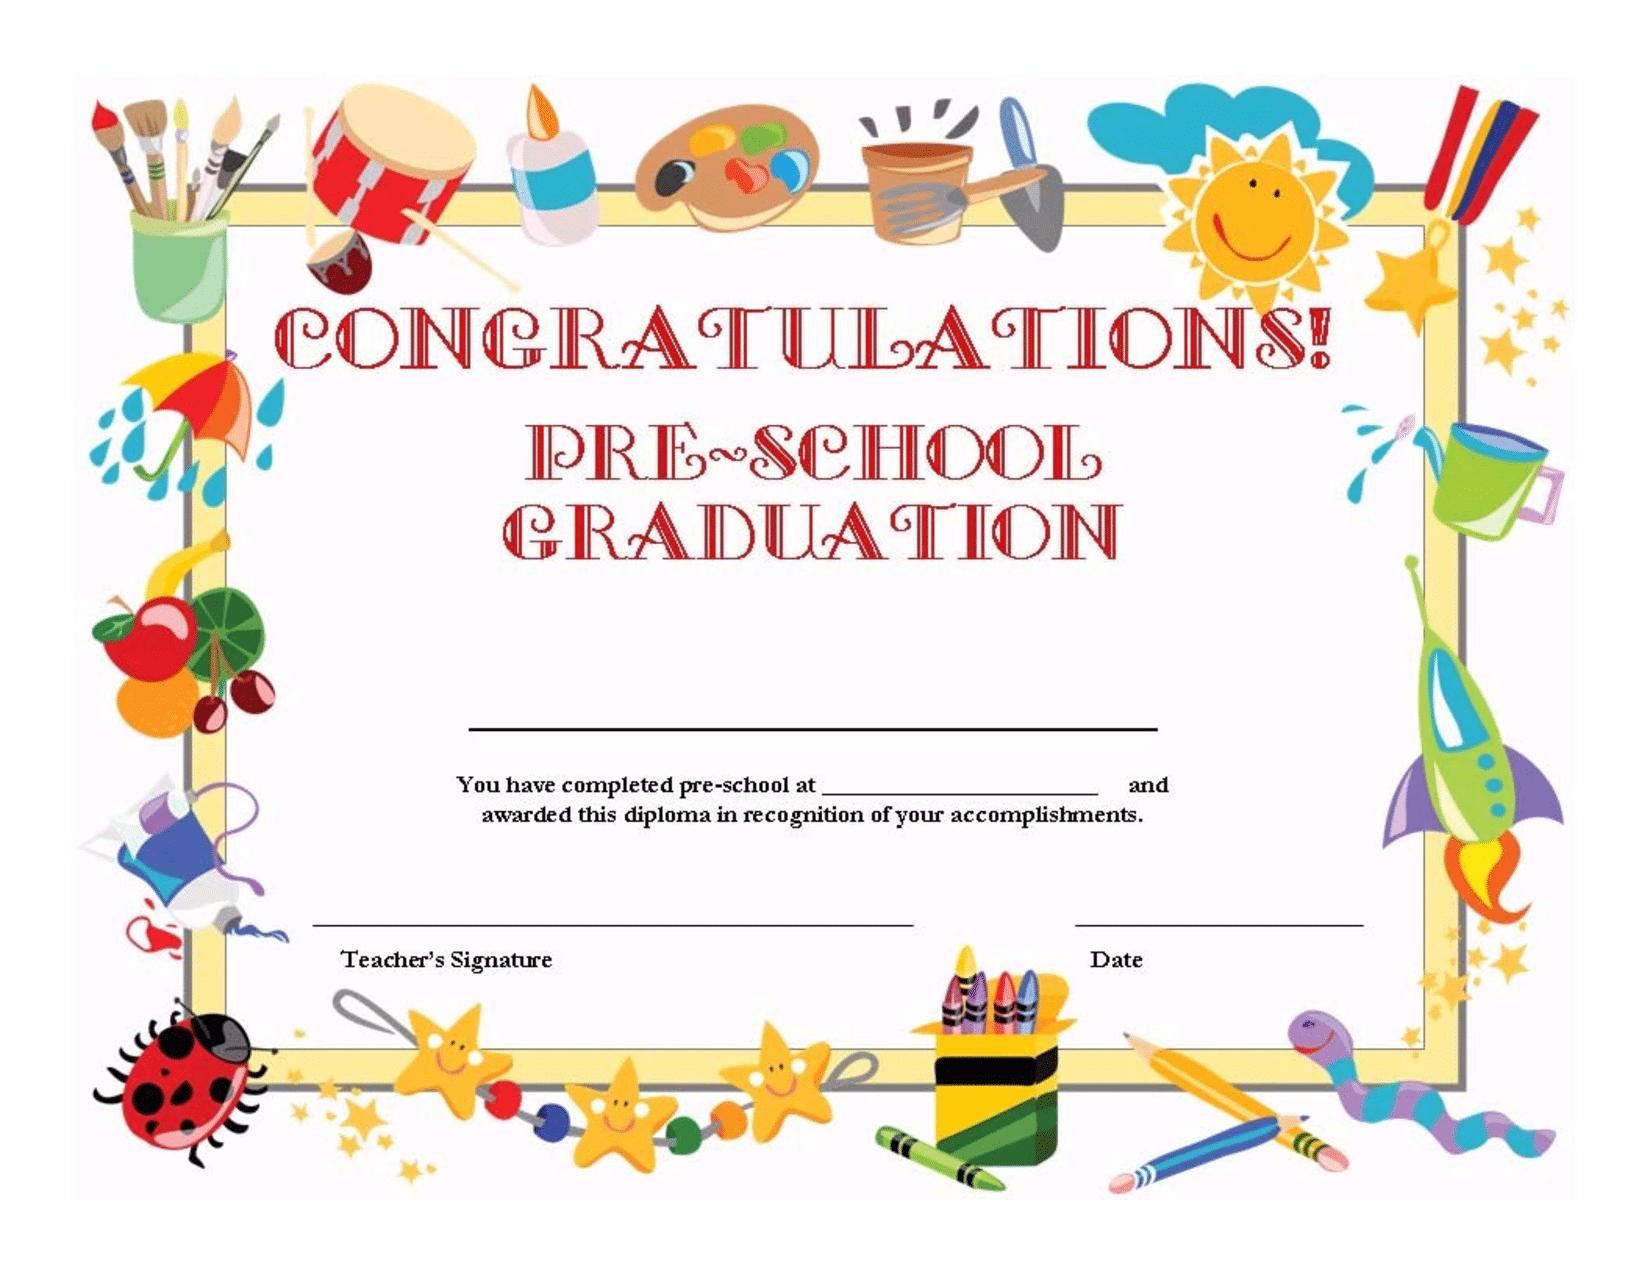 Delicate image with regard to preschool graduation invitations free printable